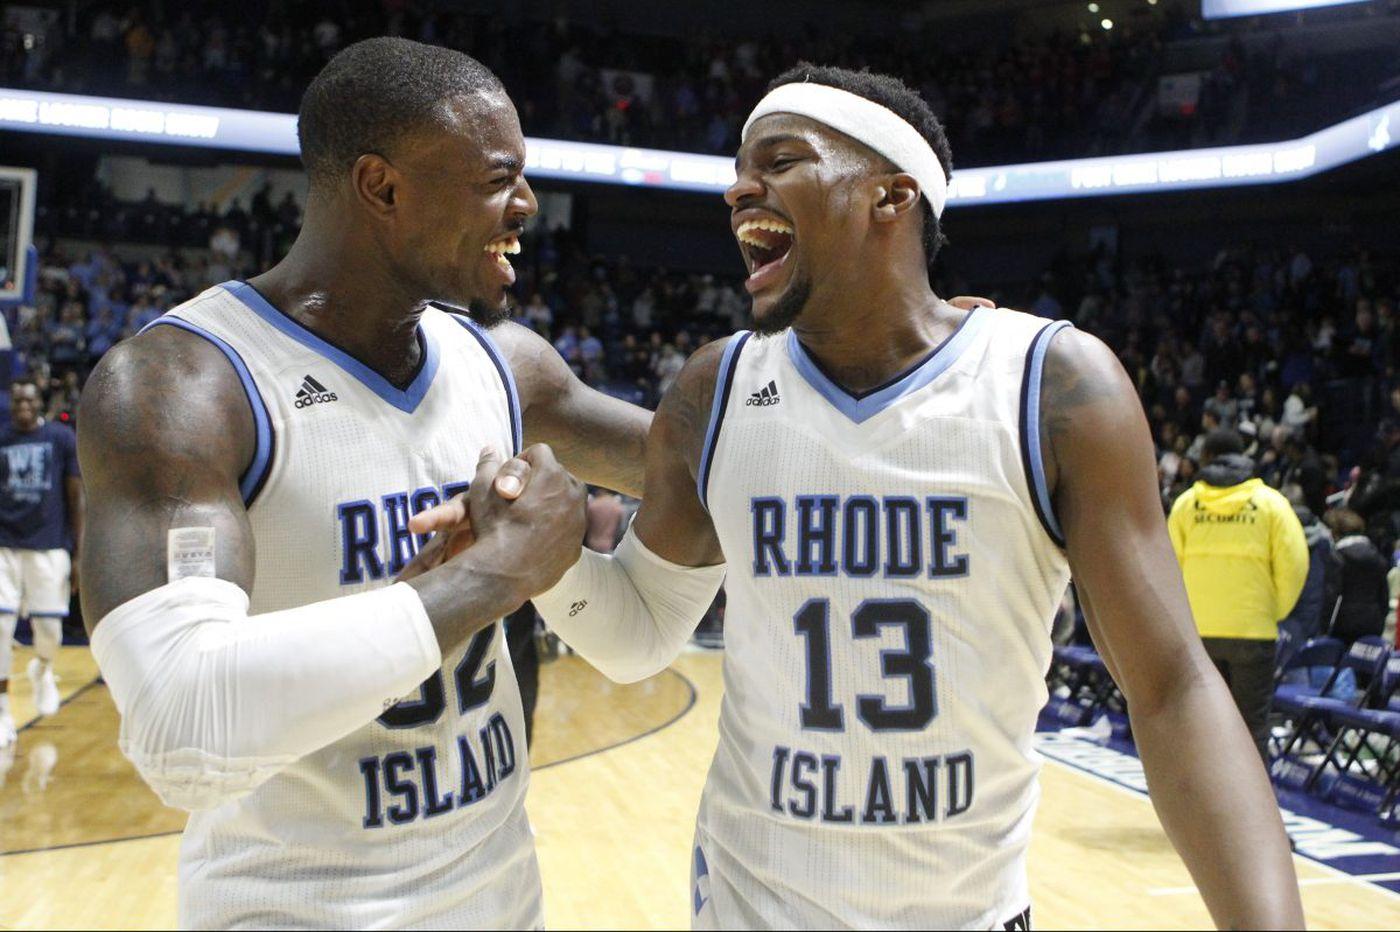 La Salle-Rhode Island preview: Explorers to host ranked Rams